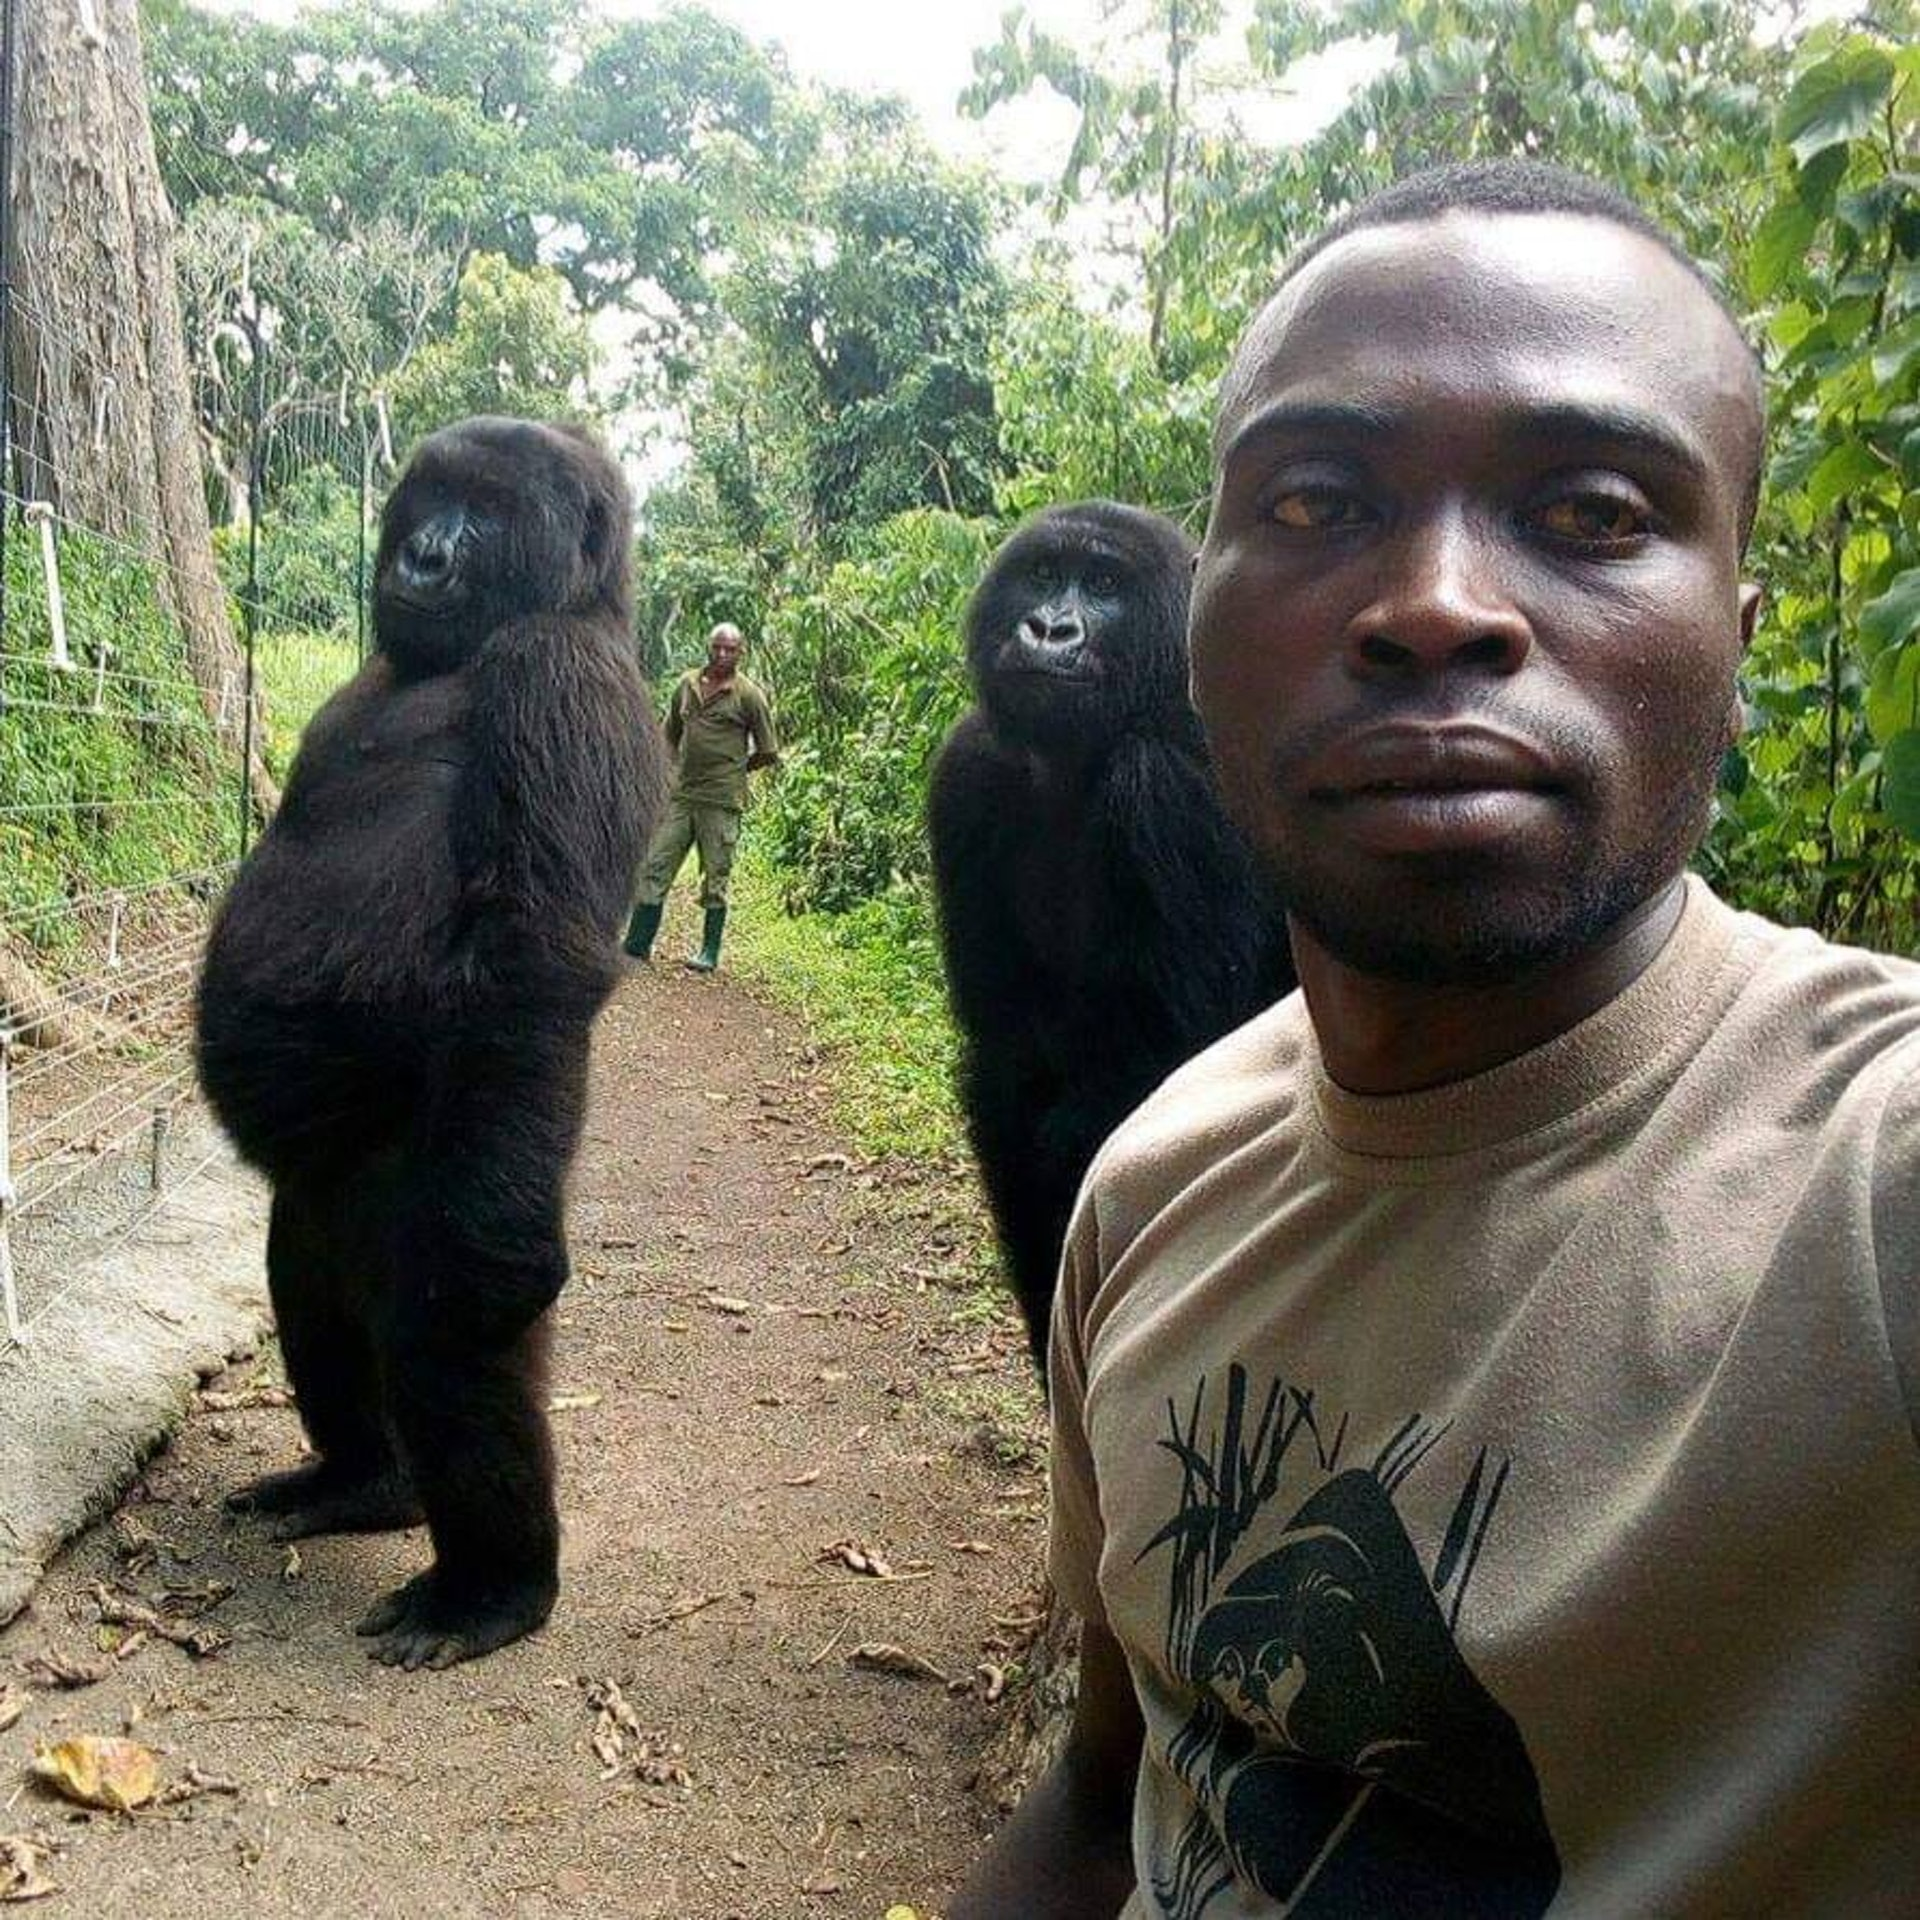 selfie with gorillas